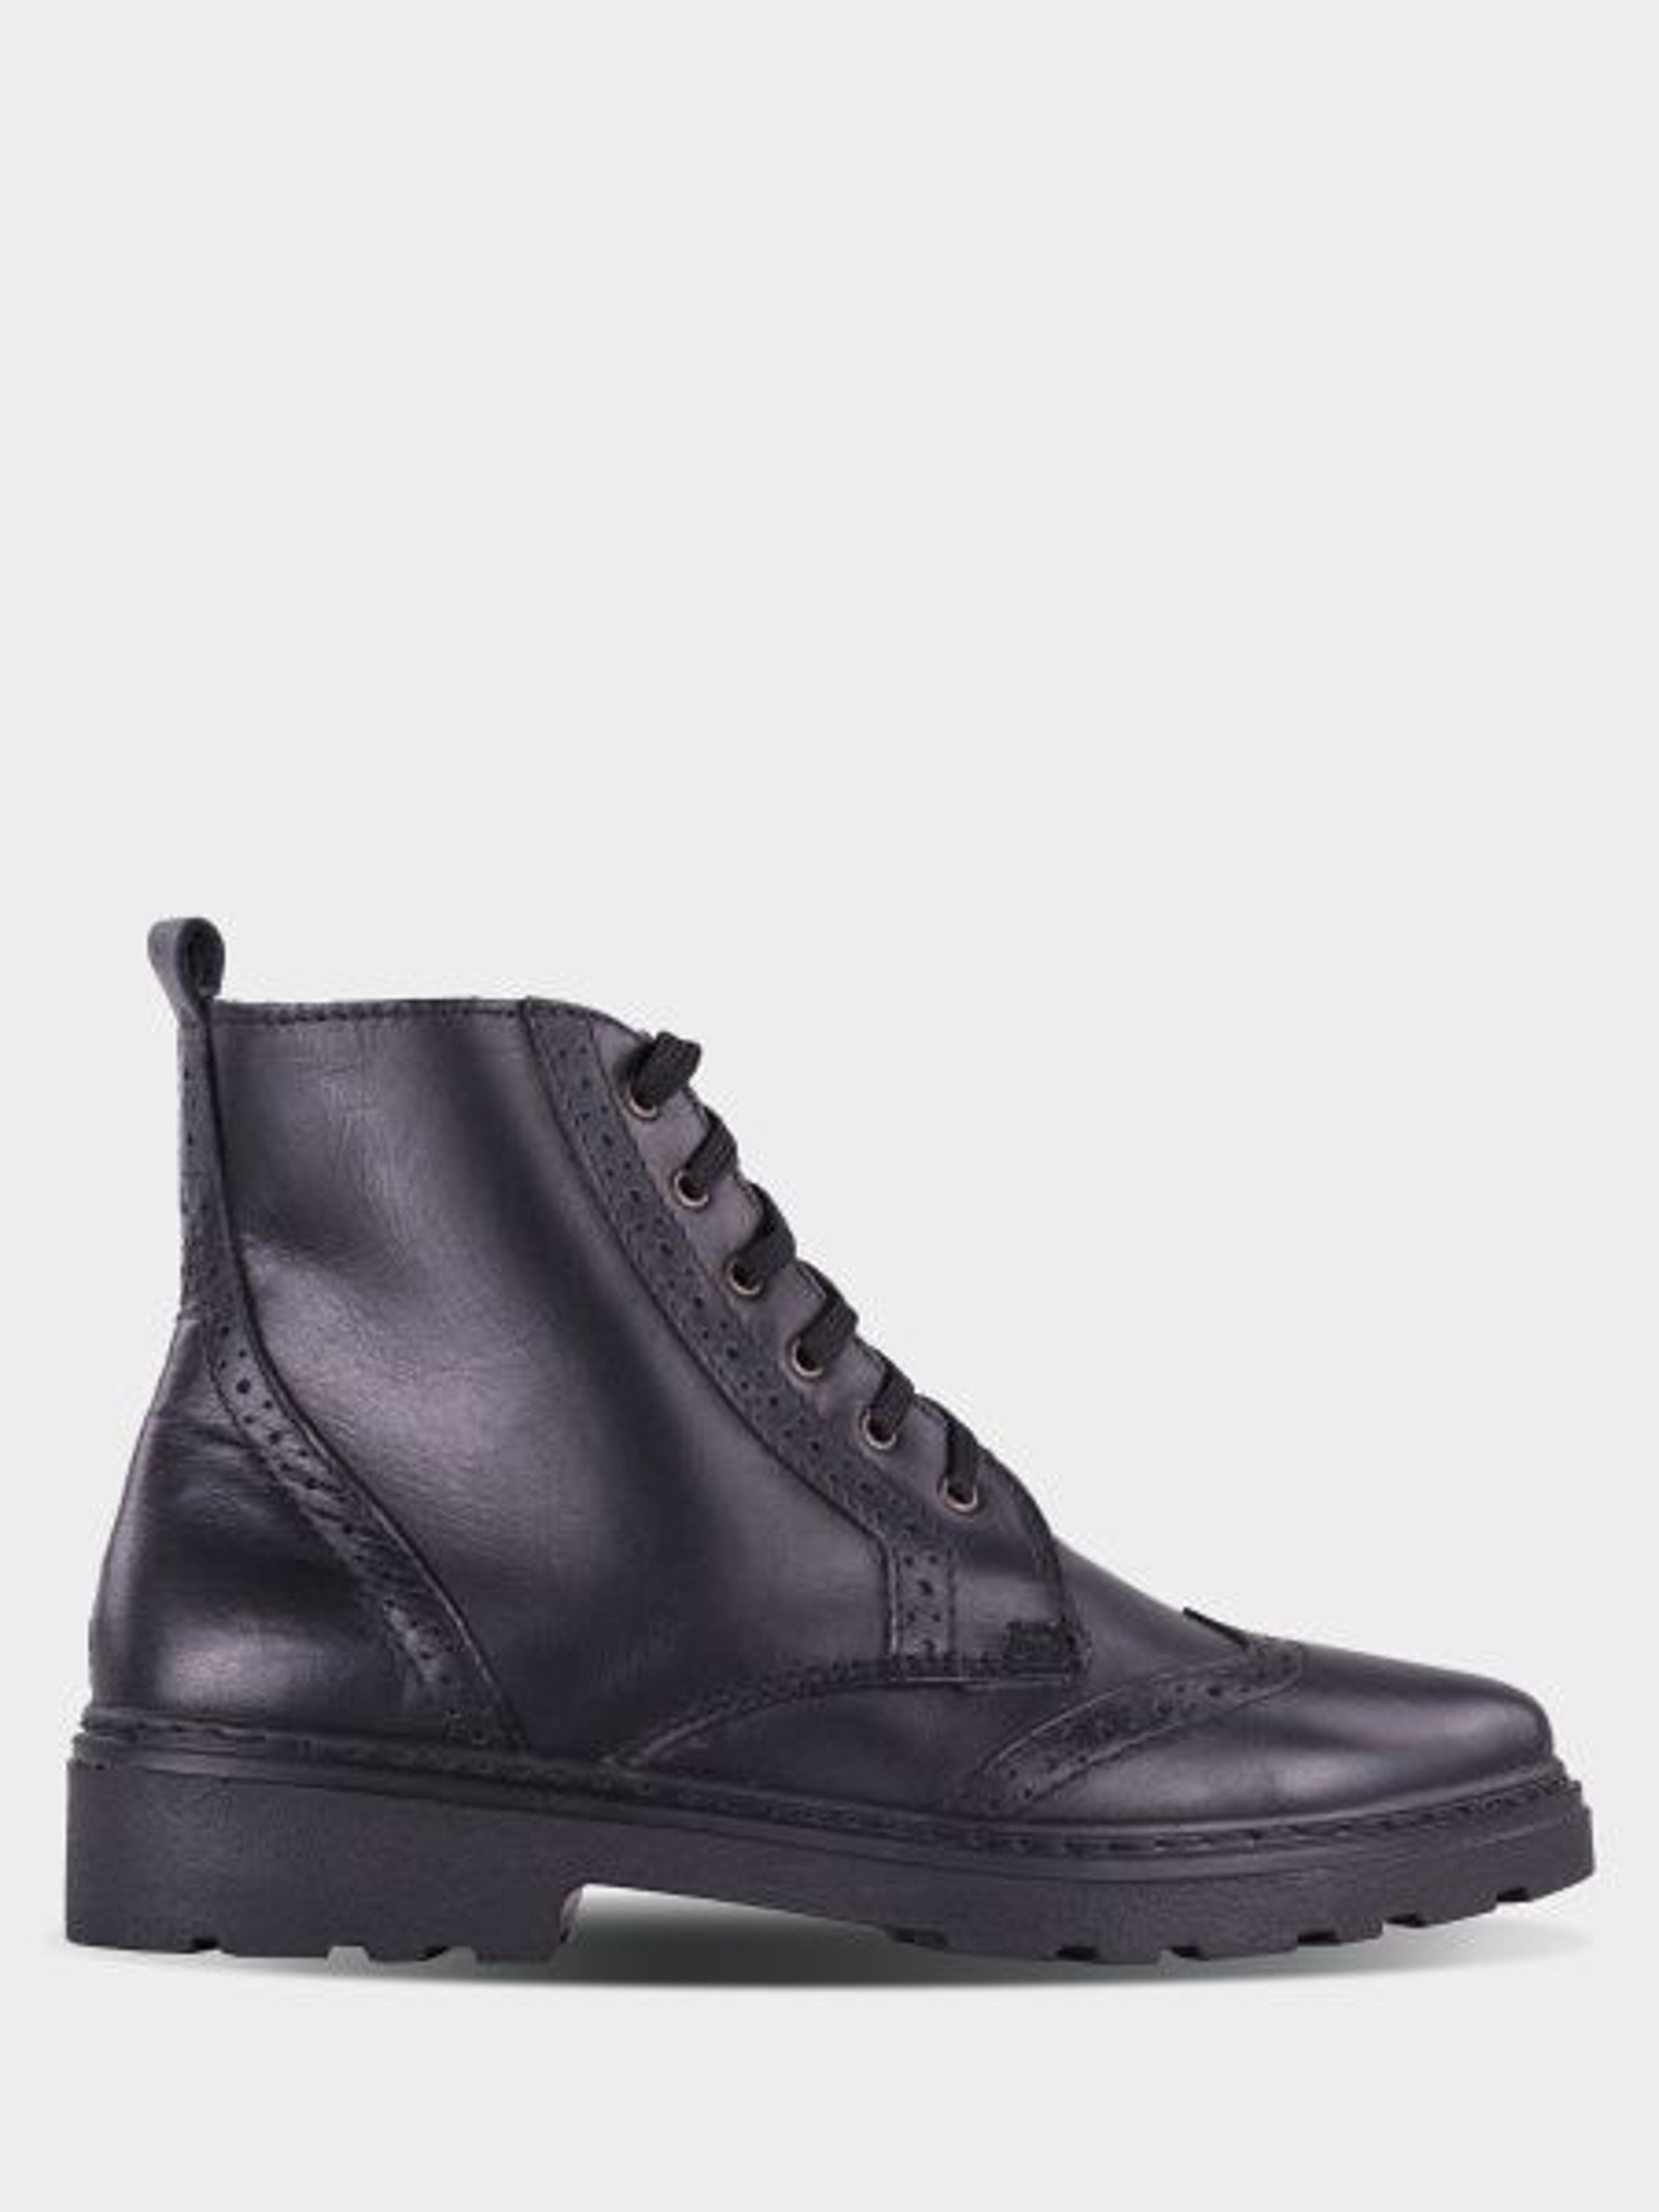 Ботинки для женщин Braska 2S69 примерка, 2017